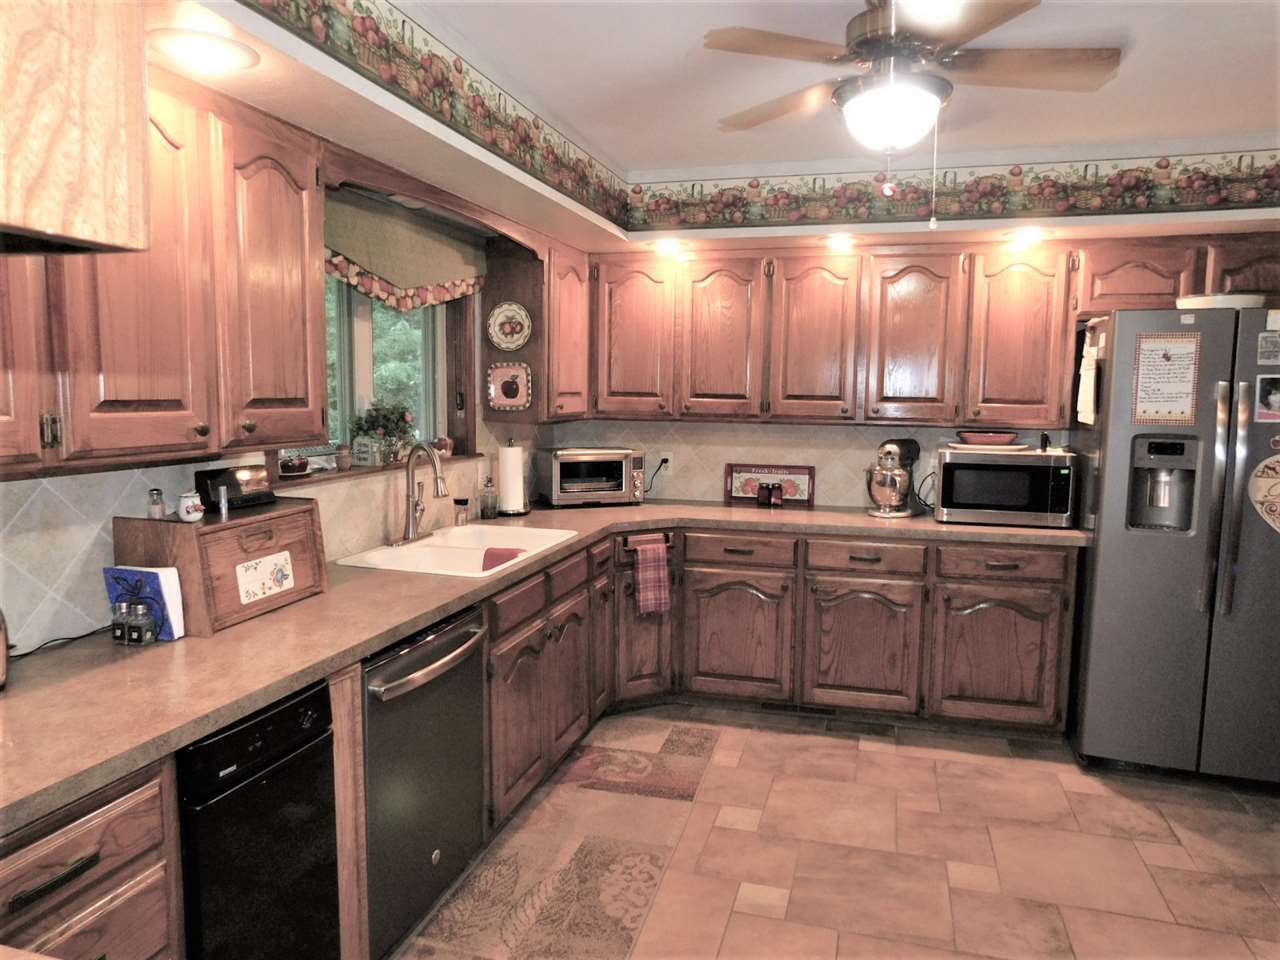 Sold Intraoffice W/MLS | 279 Braden School Rd.  Ponca City, OK 74604 7